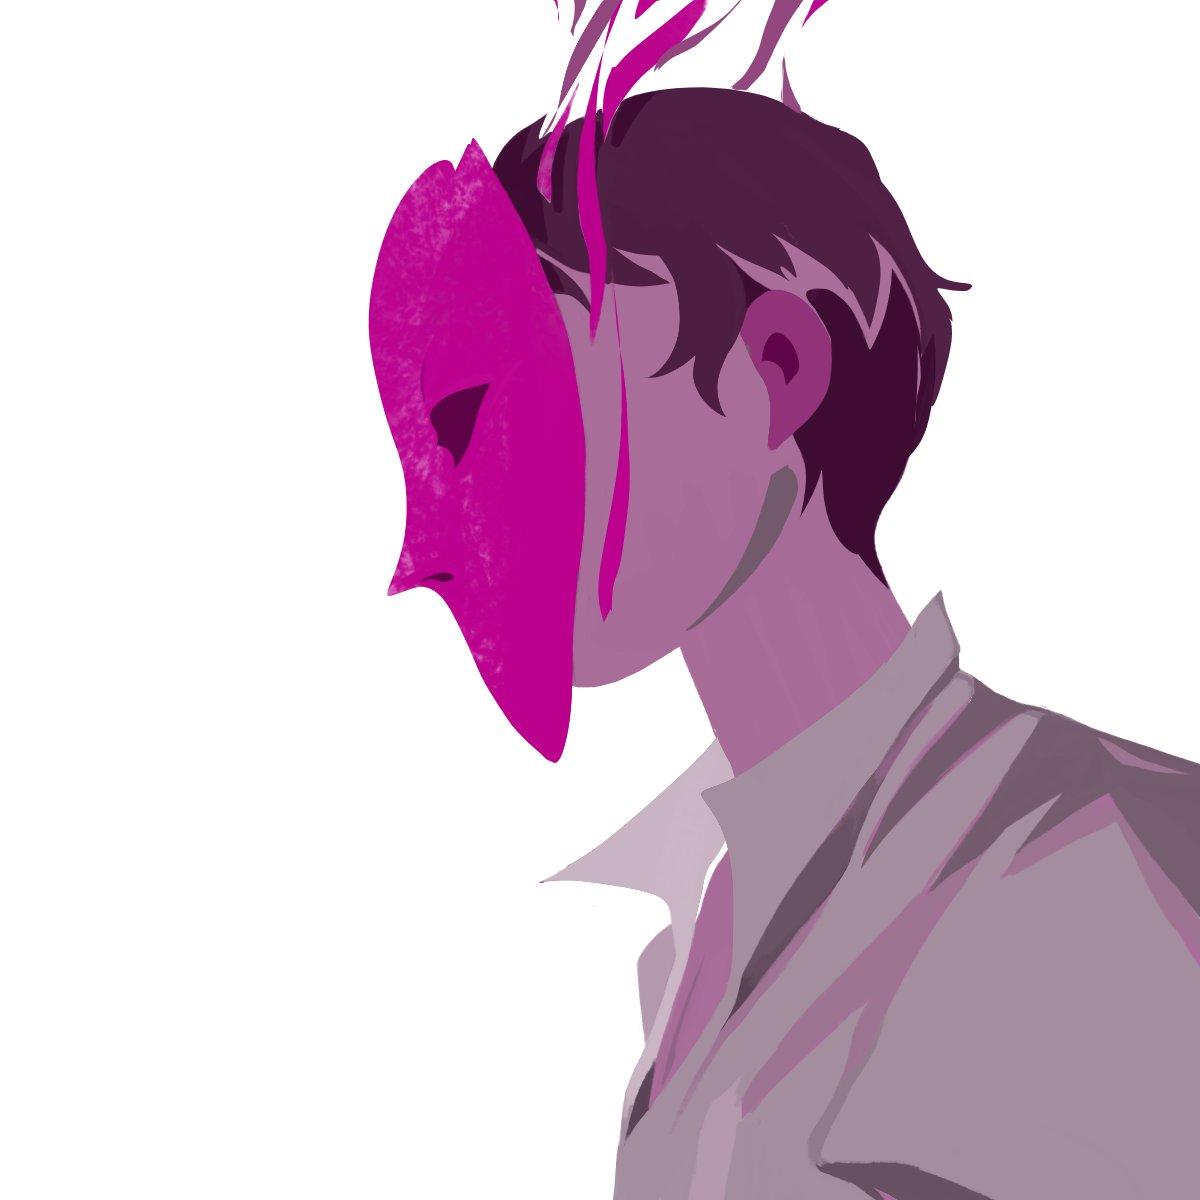 Huevember n°12  #mask #purple #boy #smoke #shirt #reflexion #huevember2020 #art #drawing